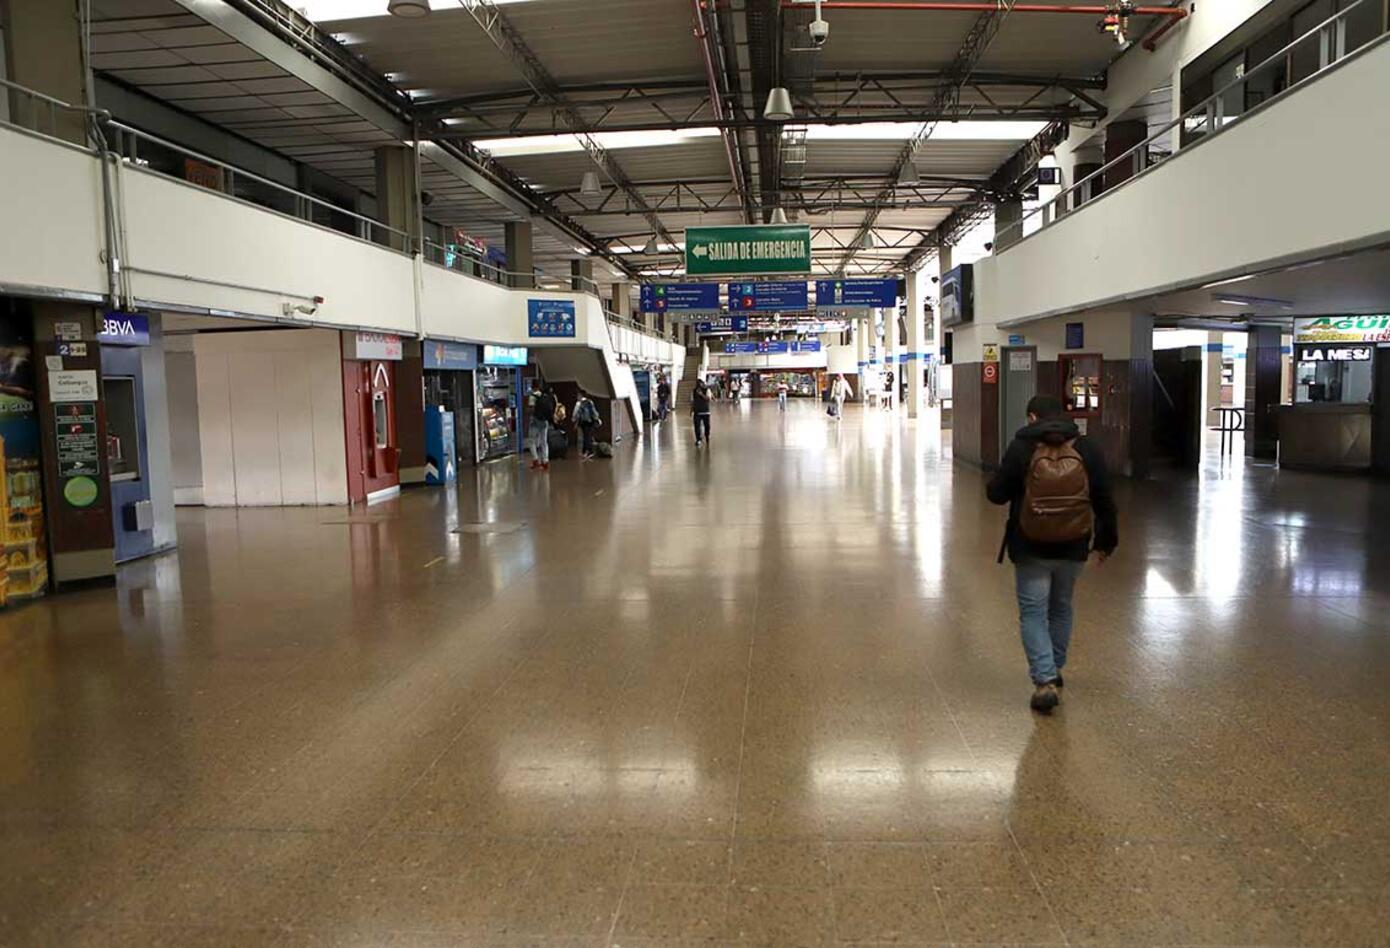 Terminal de Transporte de Salitre